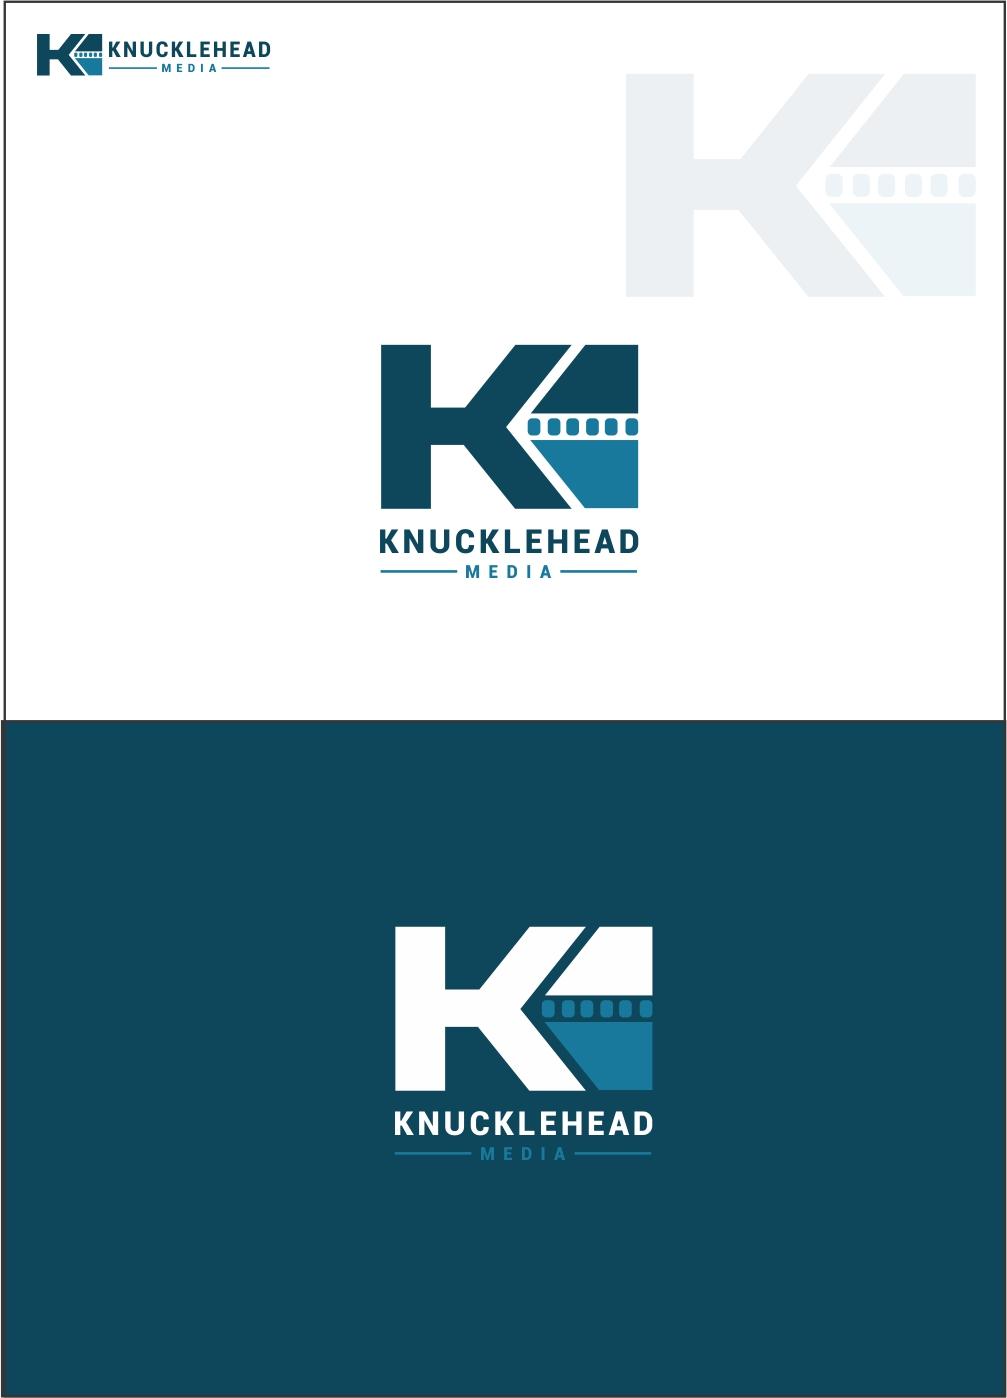 Logo Design by ian69 - Entry No. 82 in the Logo Design Contest Imaginative Logo Design for knucklehead media.